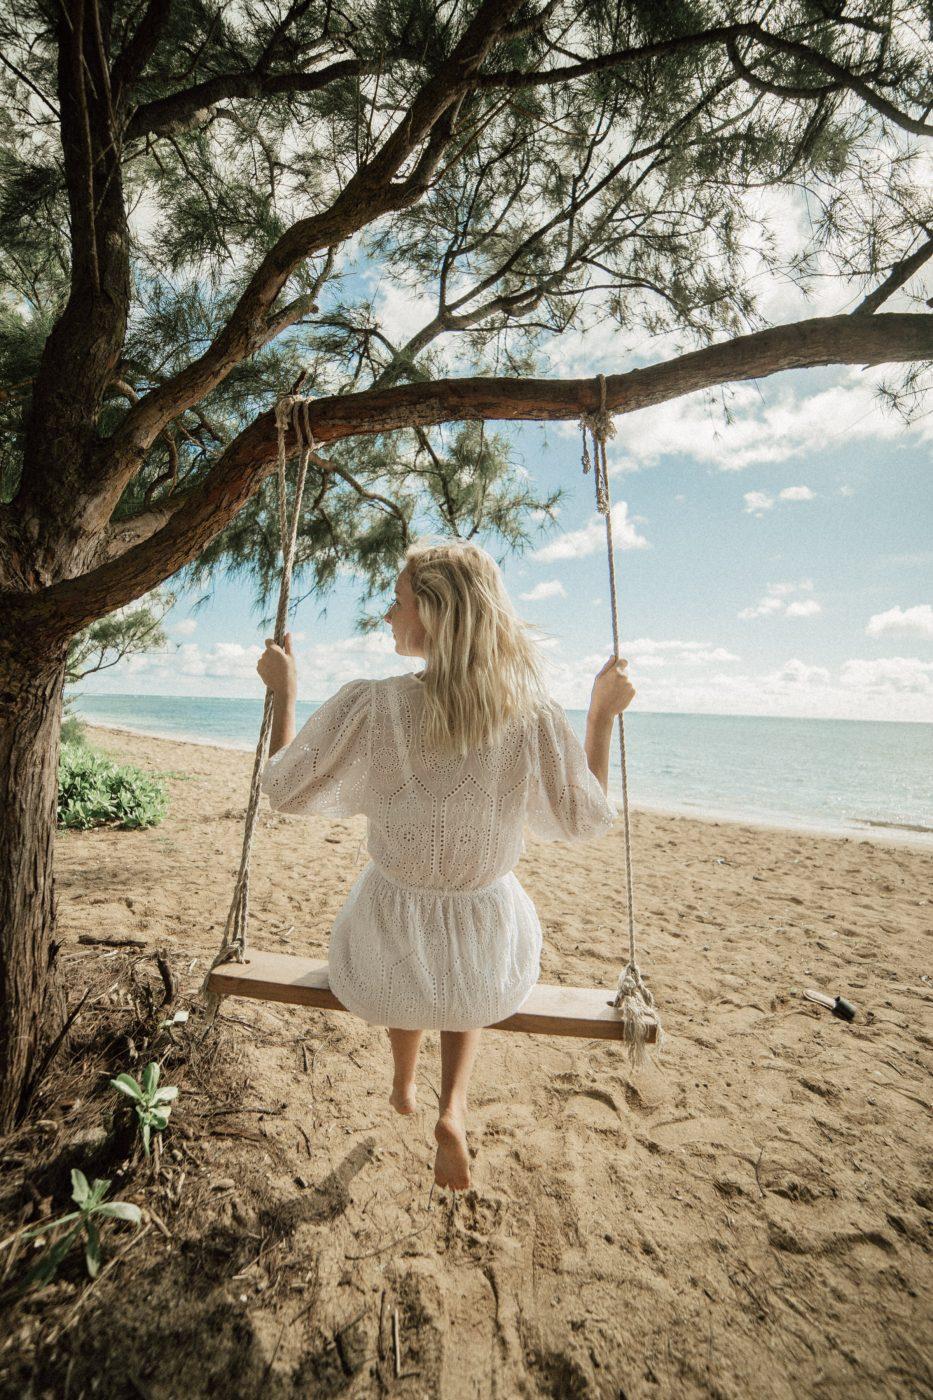 Oahu Hawaii Travel Guide - Sweet Teal